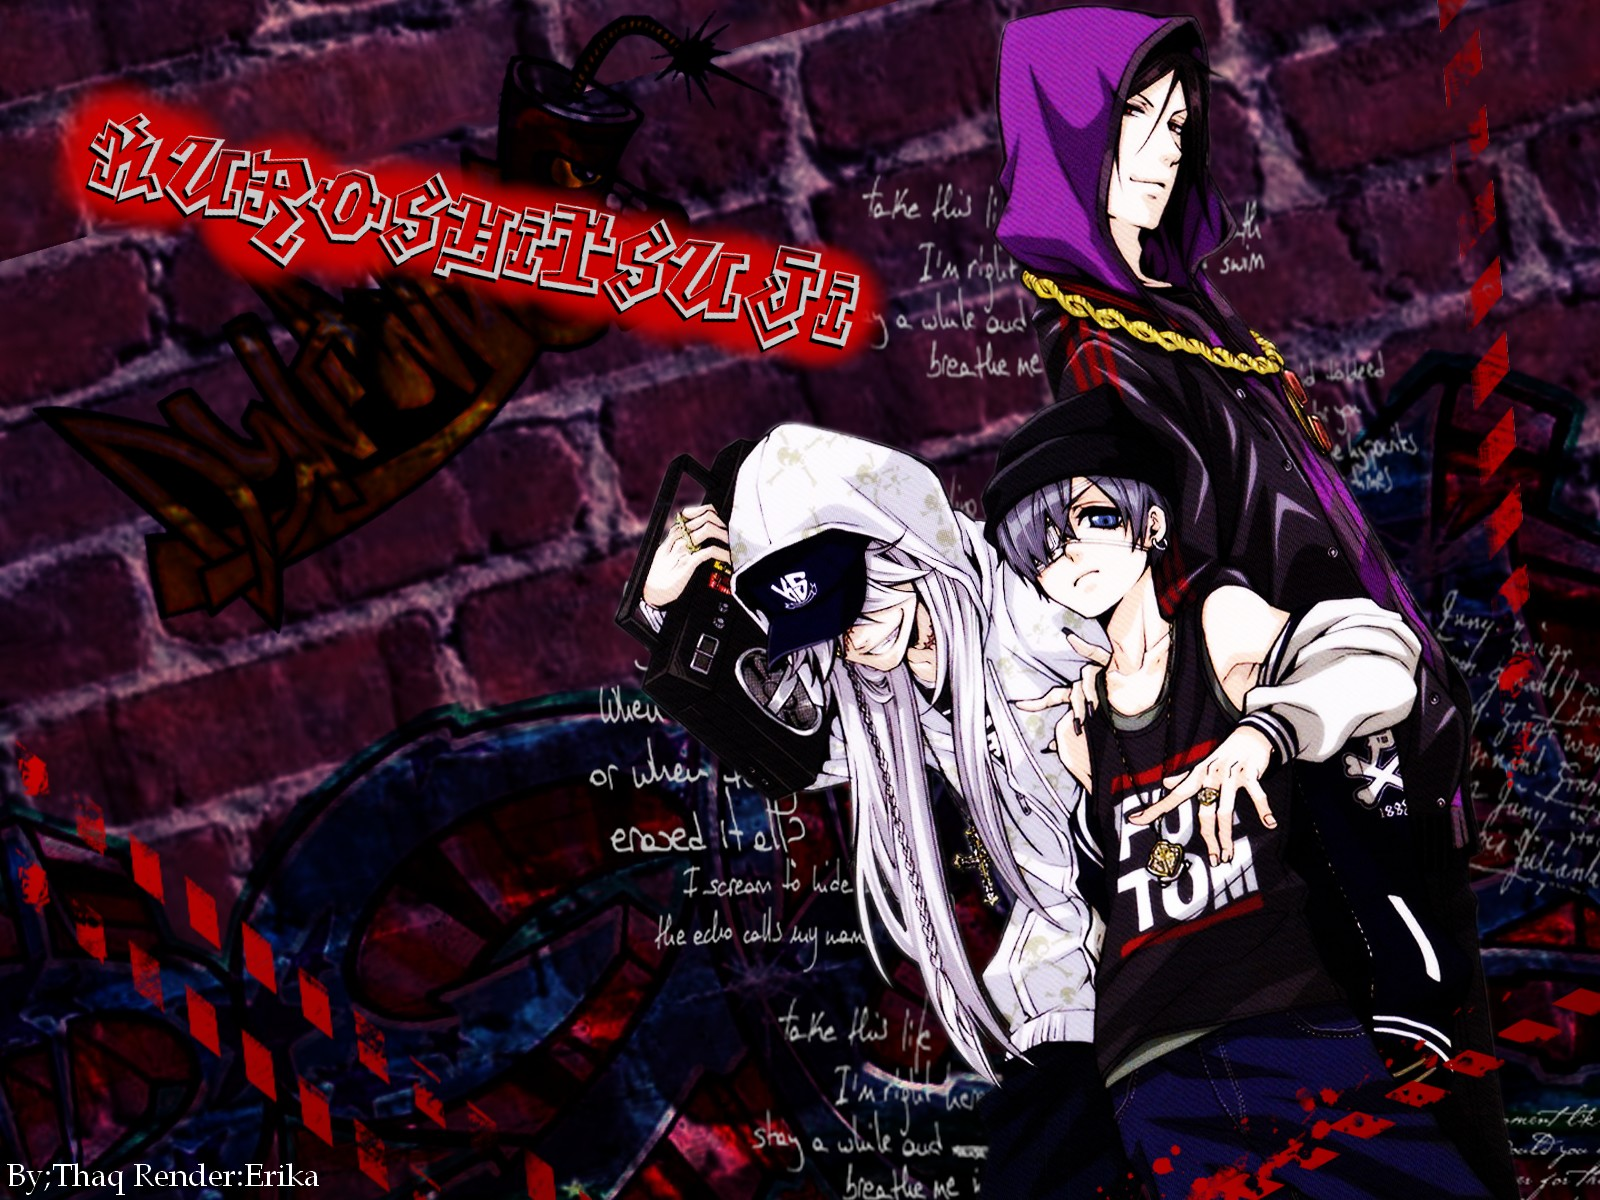 kuroshitsuji wallpaper-hip hoppookiemania on deviantart